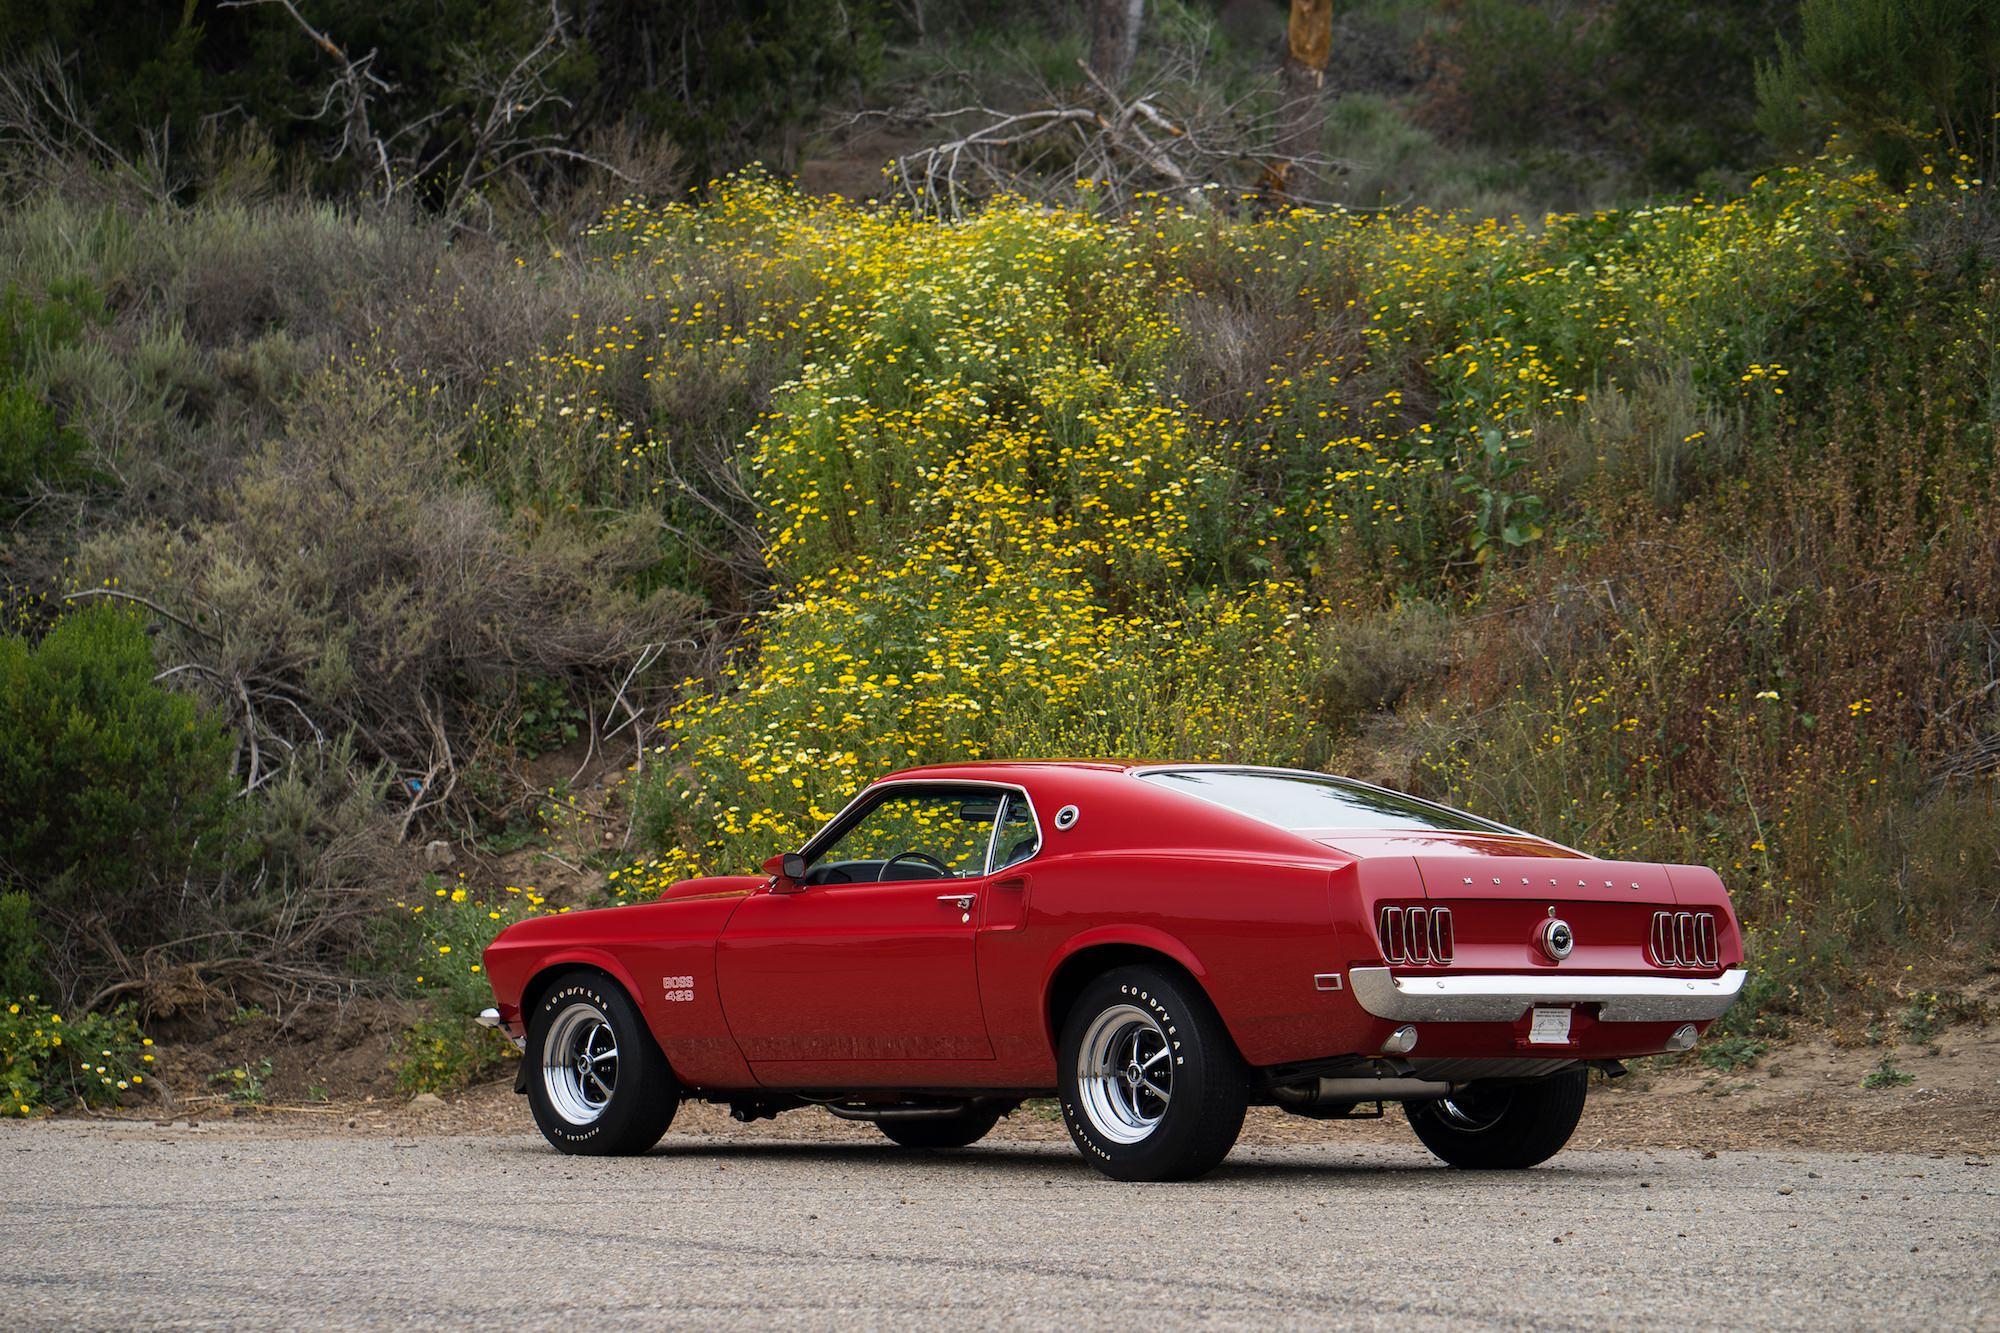 Kleurplaten Auto Ford Mustang.1969 Boss 429 Ford Mustang